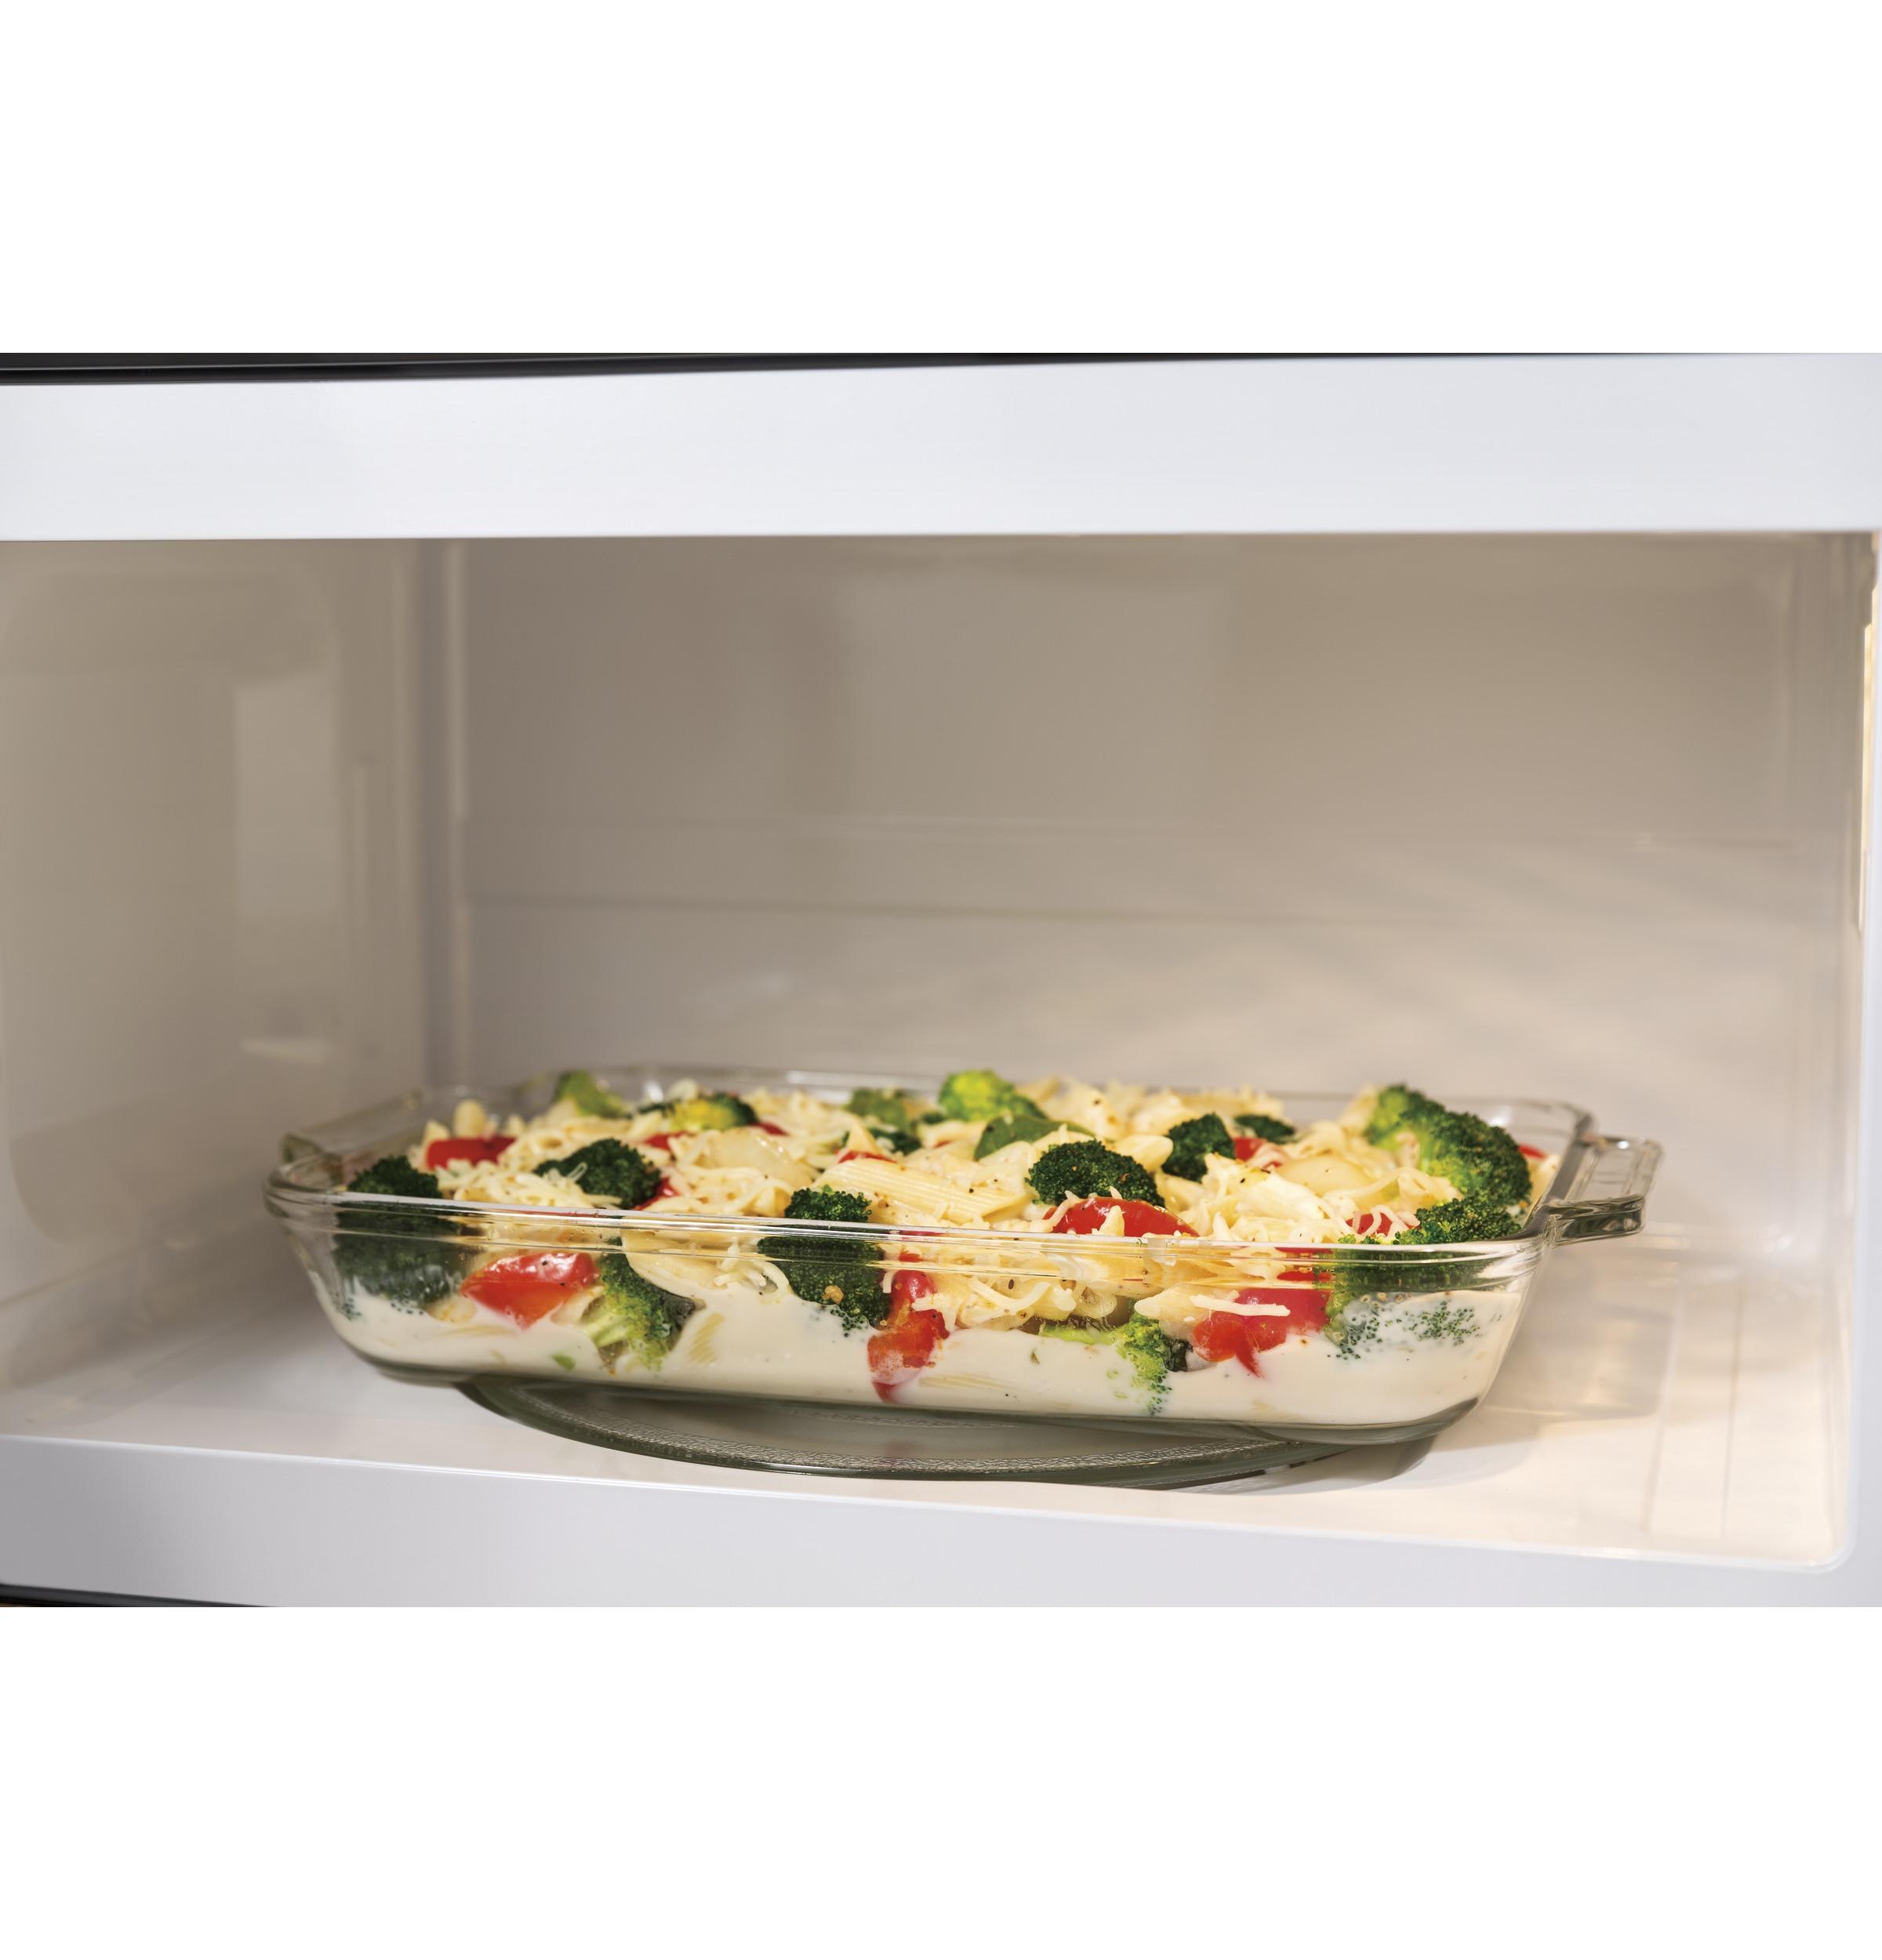 Model: JVM6172SKSS | GE GE® 1.7 Cu. Ft. Over-the-Range Microwave Oven